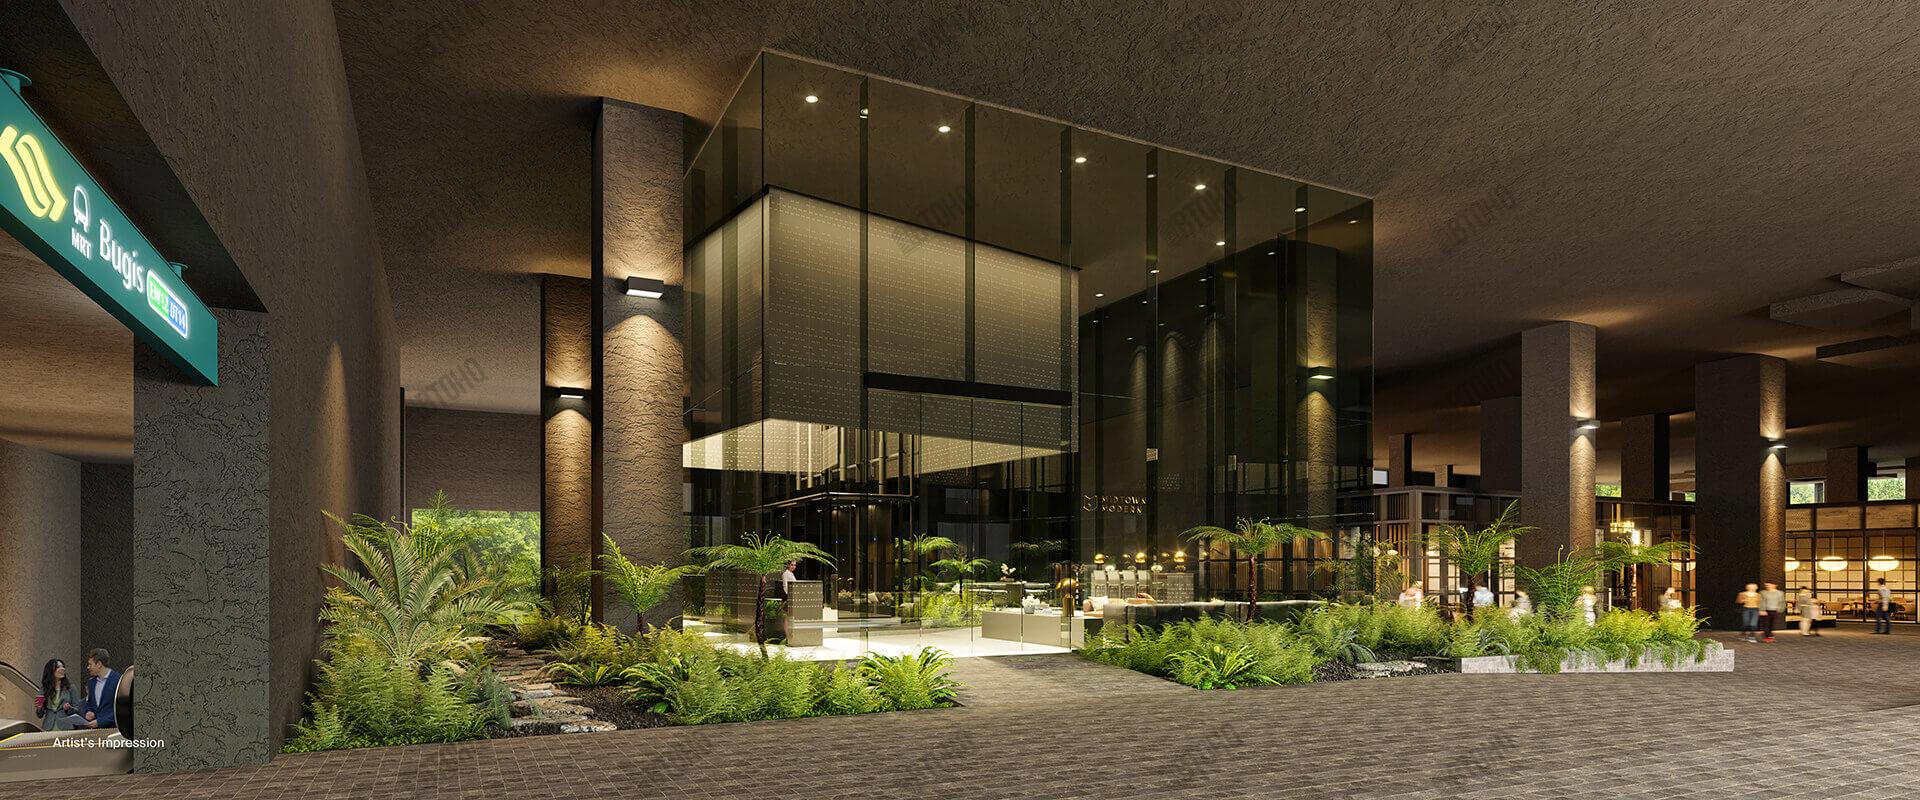 Midtown Modern Entrance